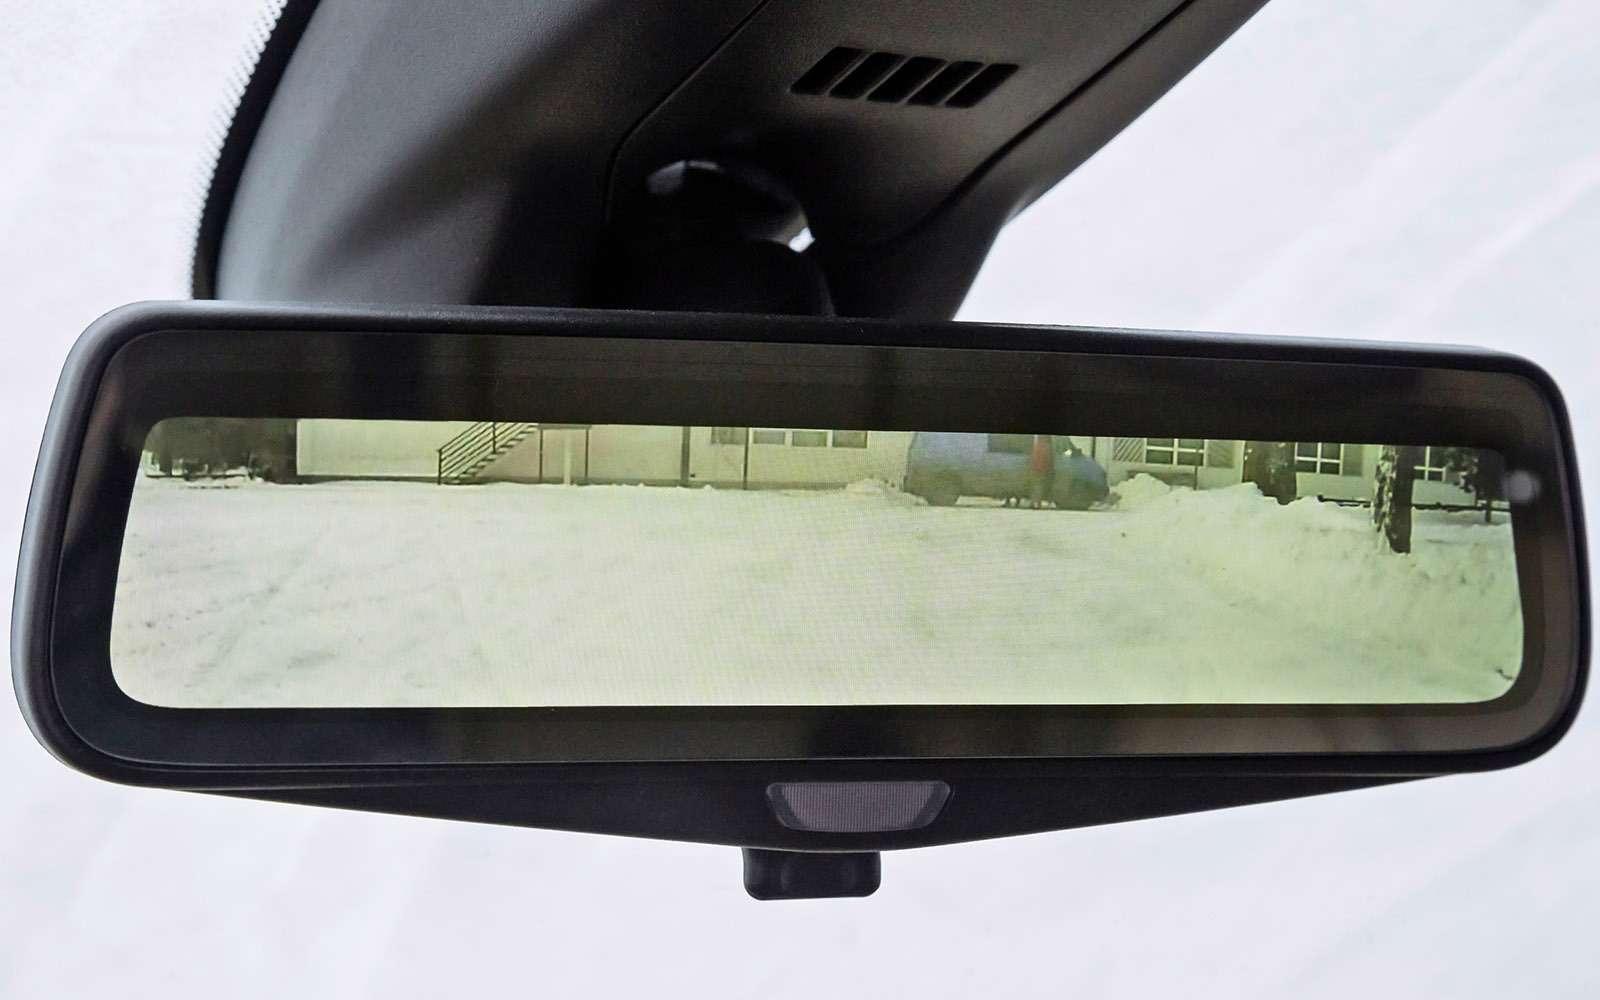 Тест премиум-кроссоверов: Lexus RX350, Cadillac XT5и Jaguar F-Pace— фото 721802